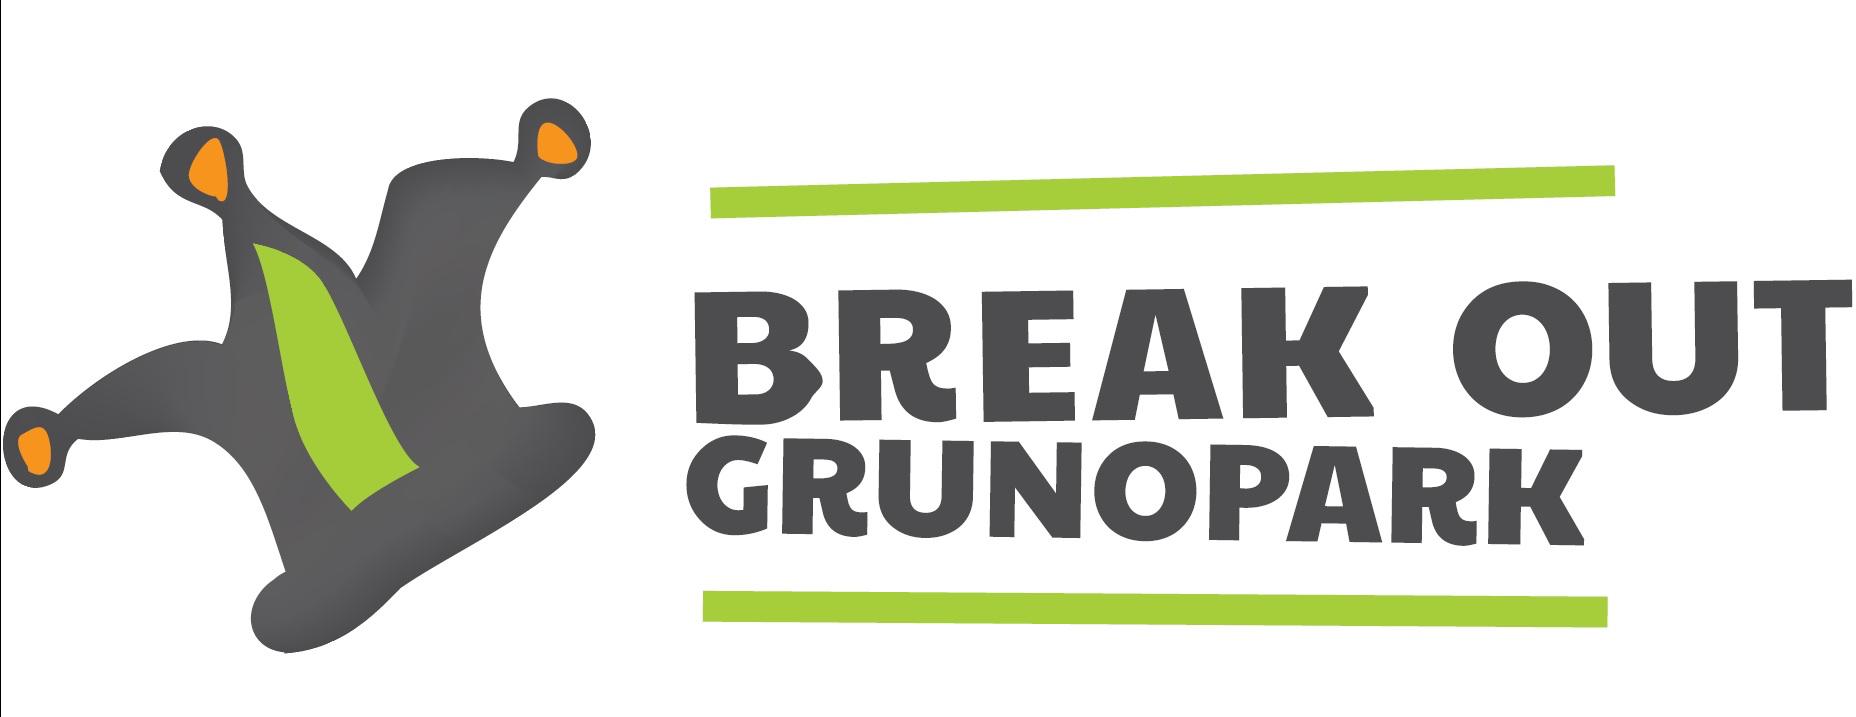 Break Out Grunopark